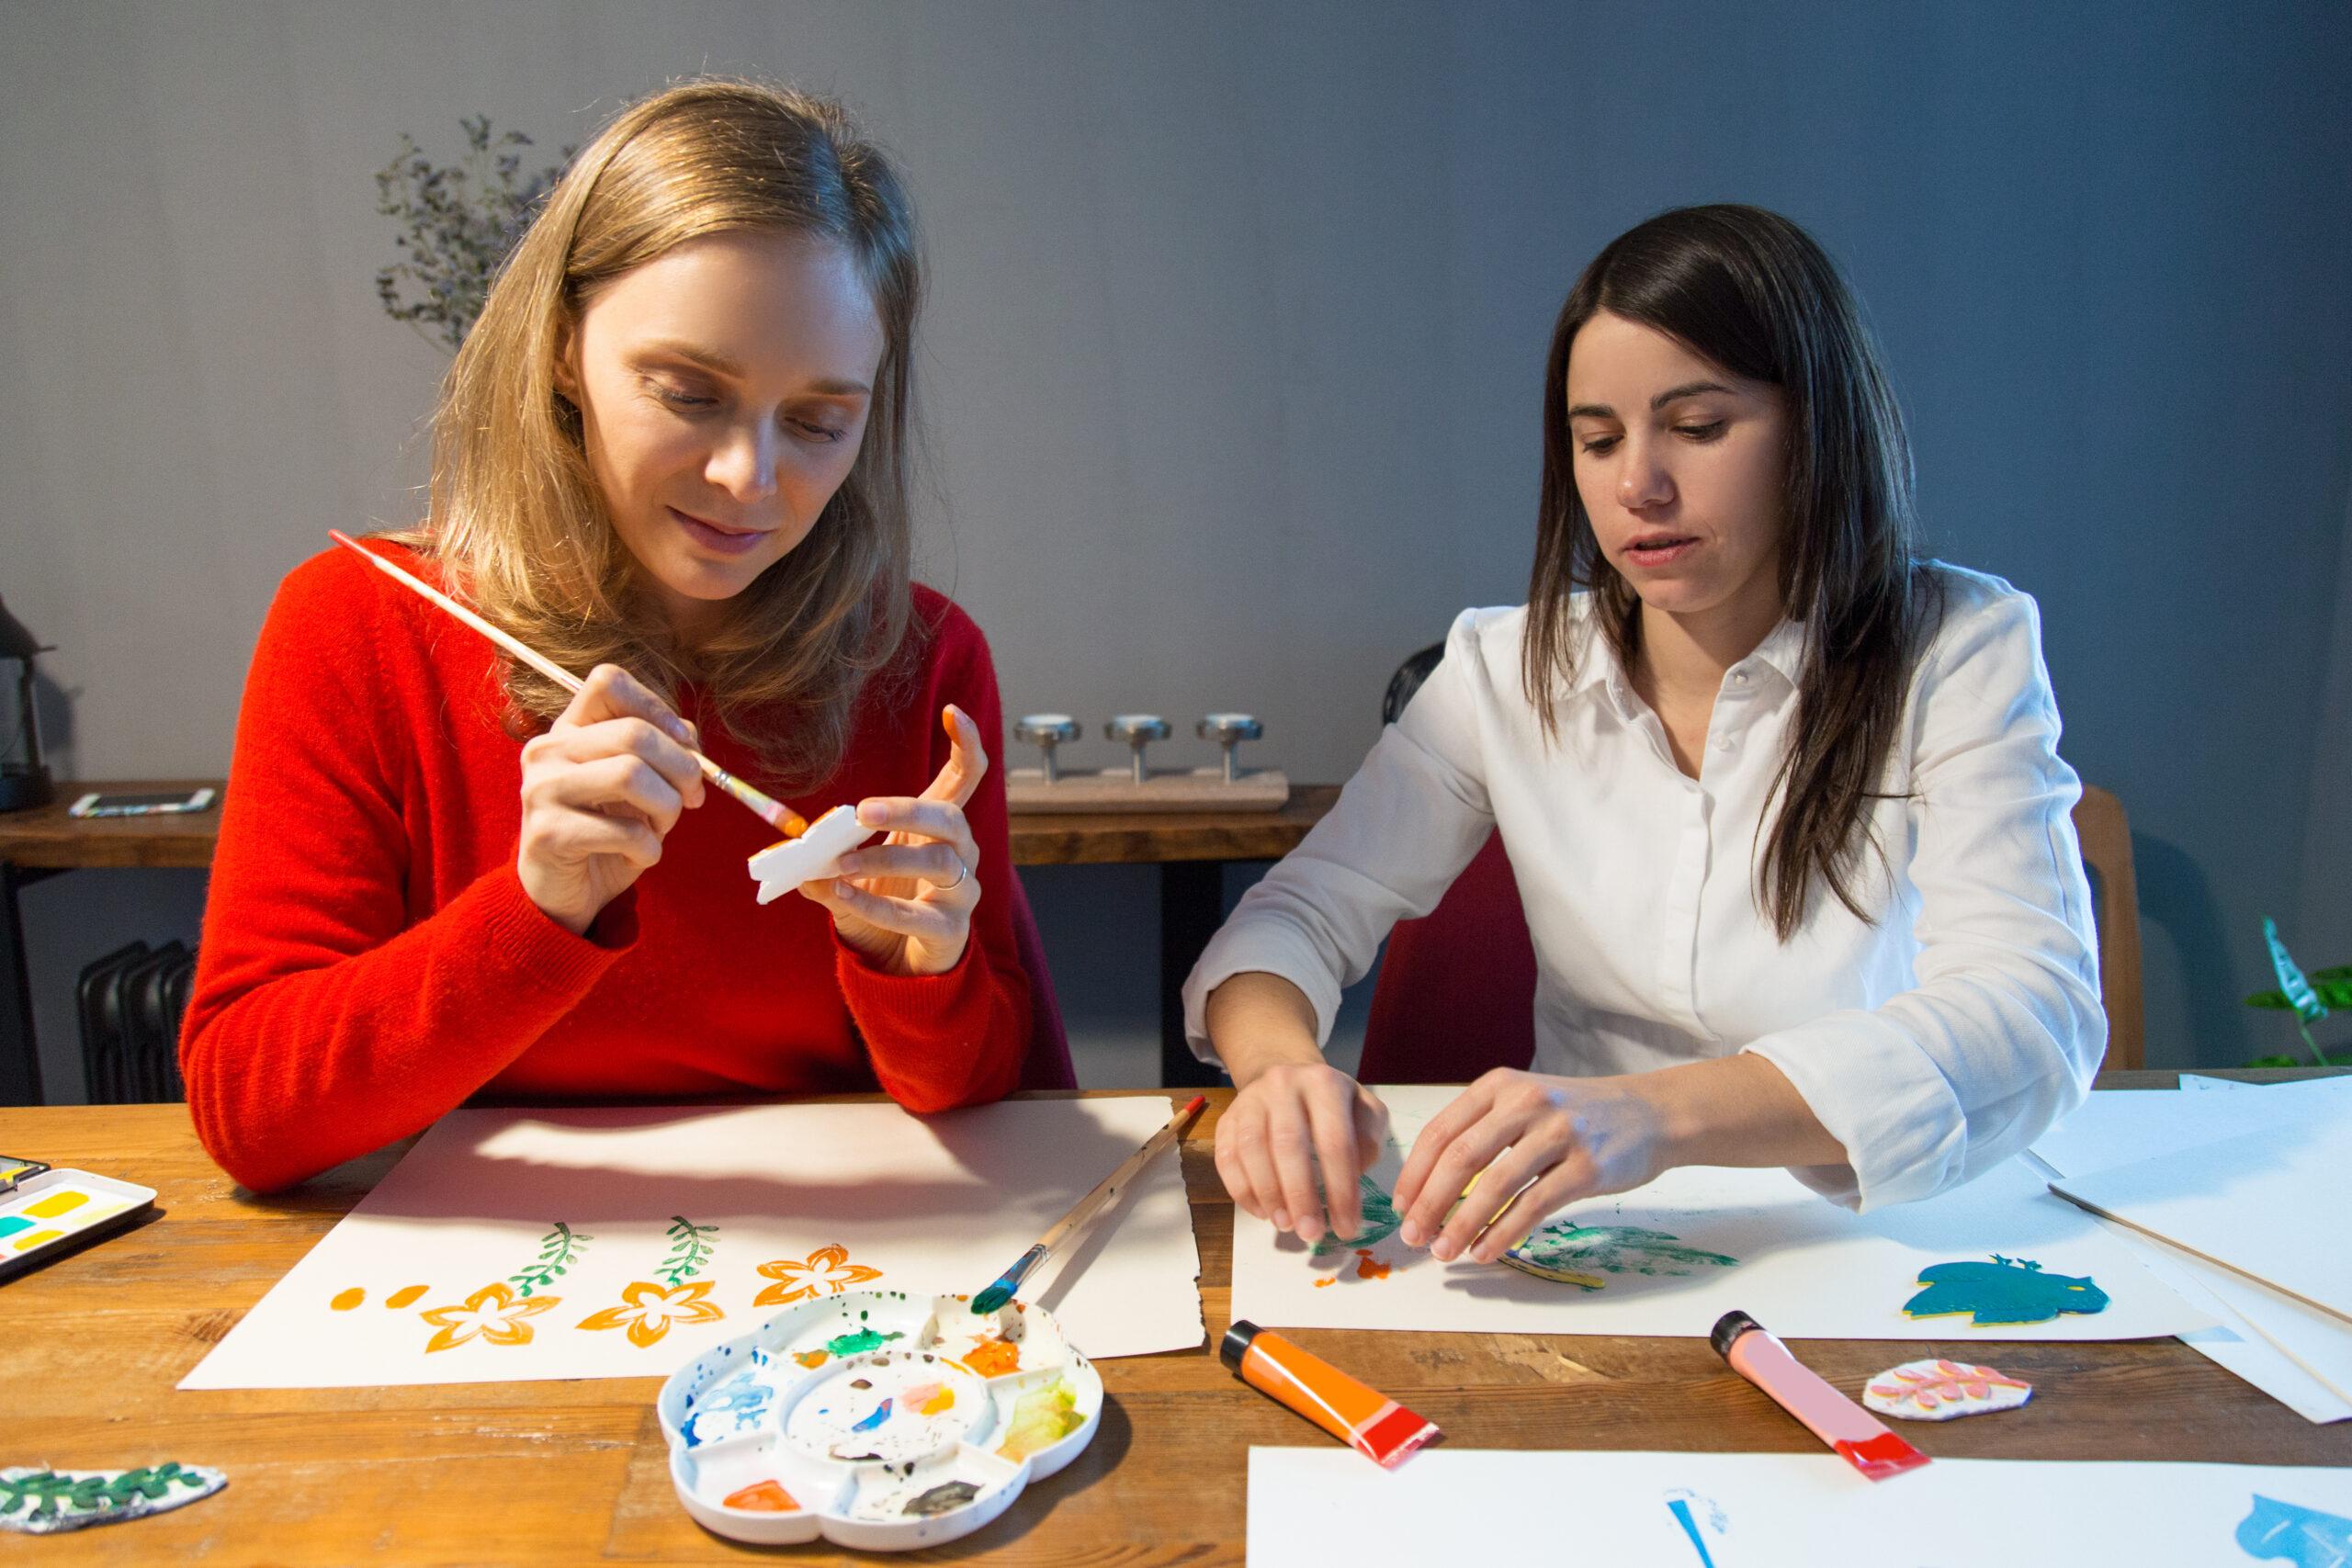 Two peaceful girls enjoying simple painting